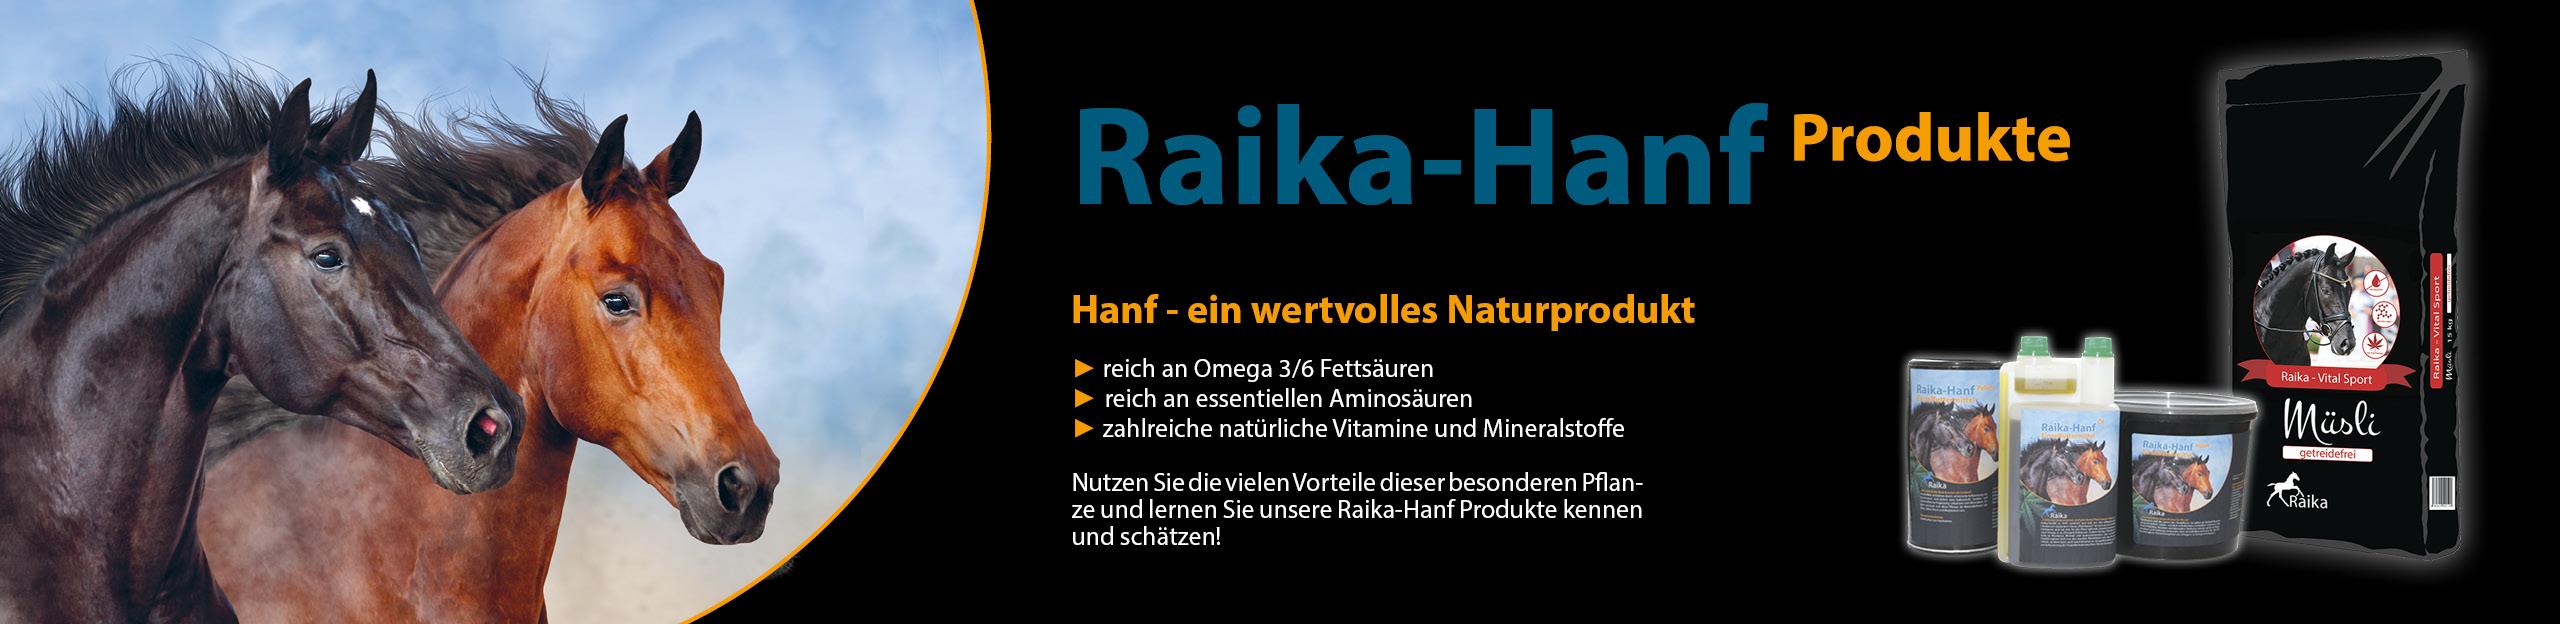 Banner Raika-Hanf Serie